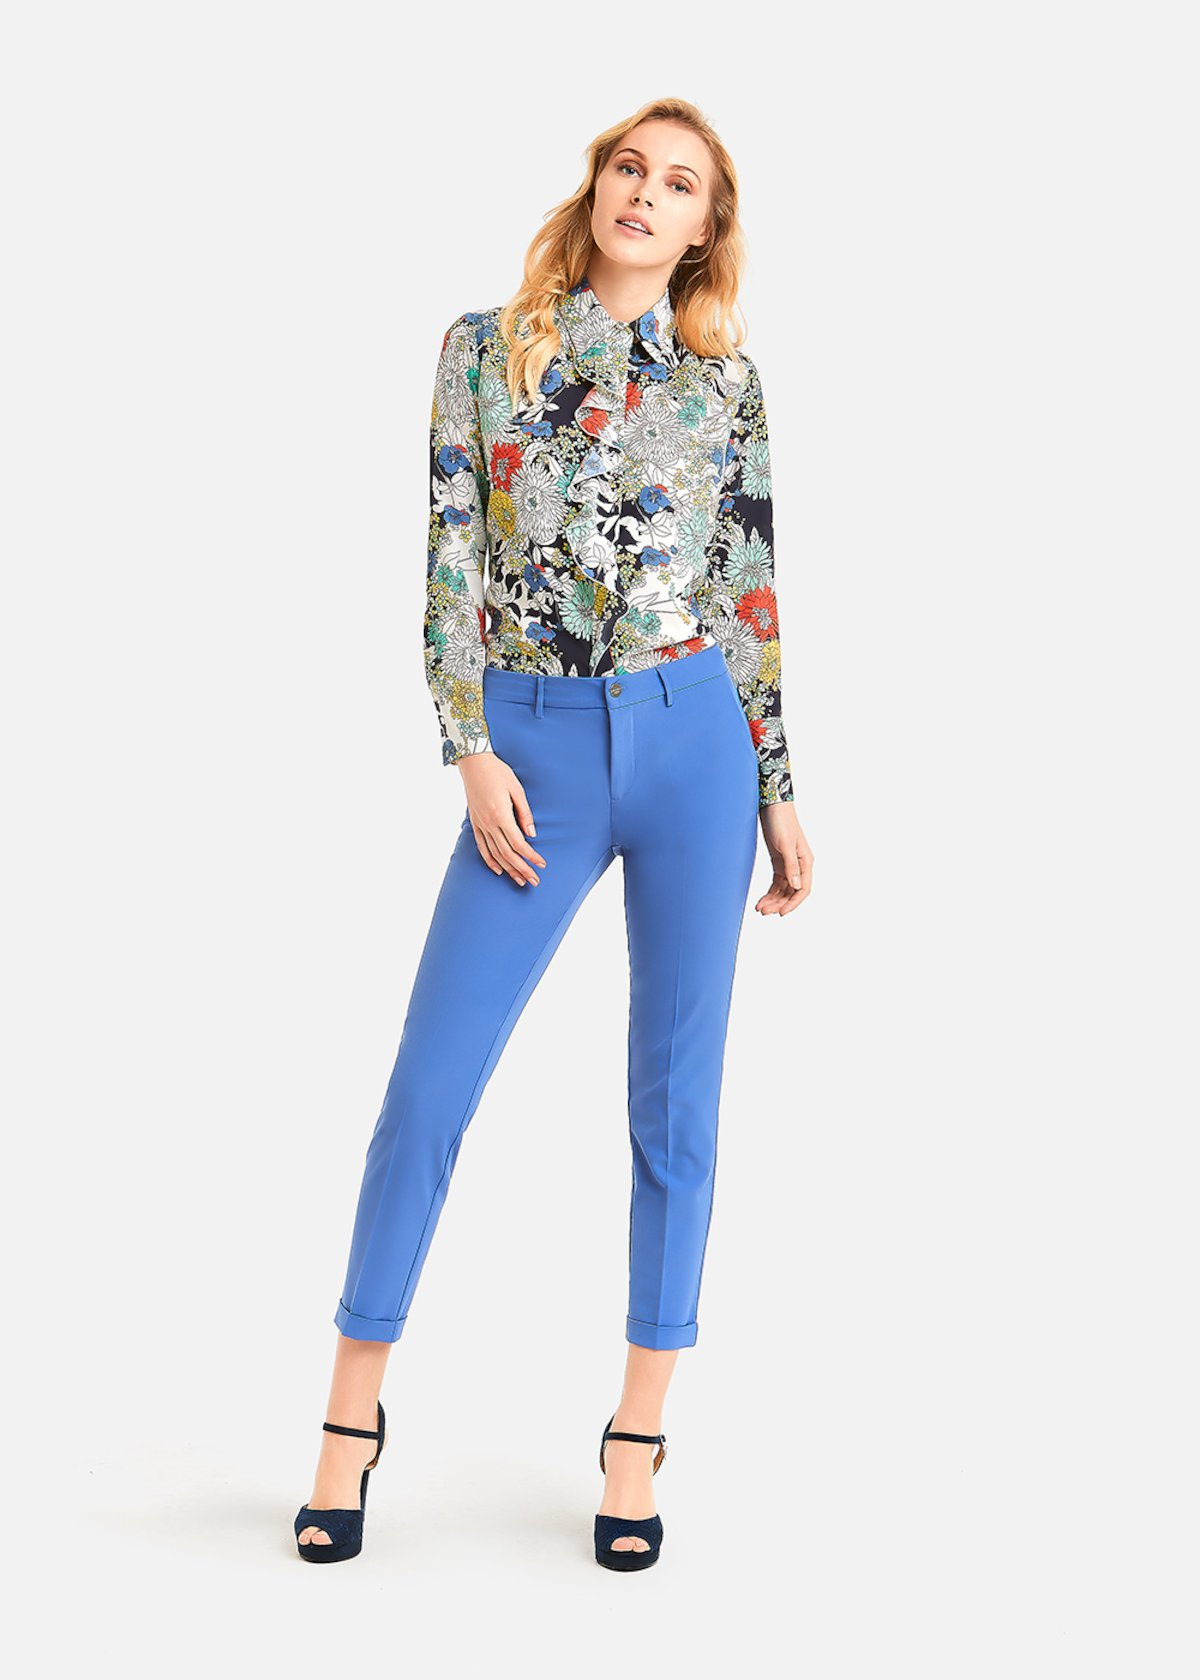 Carina shirt flower bang pattern - White /  Lemon Fantasia